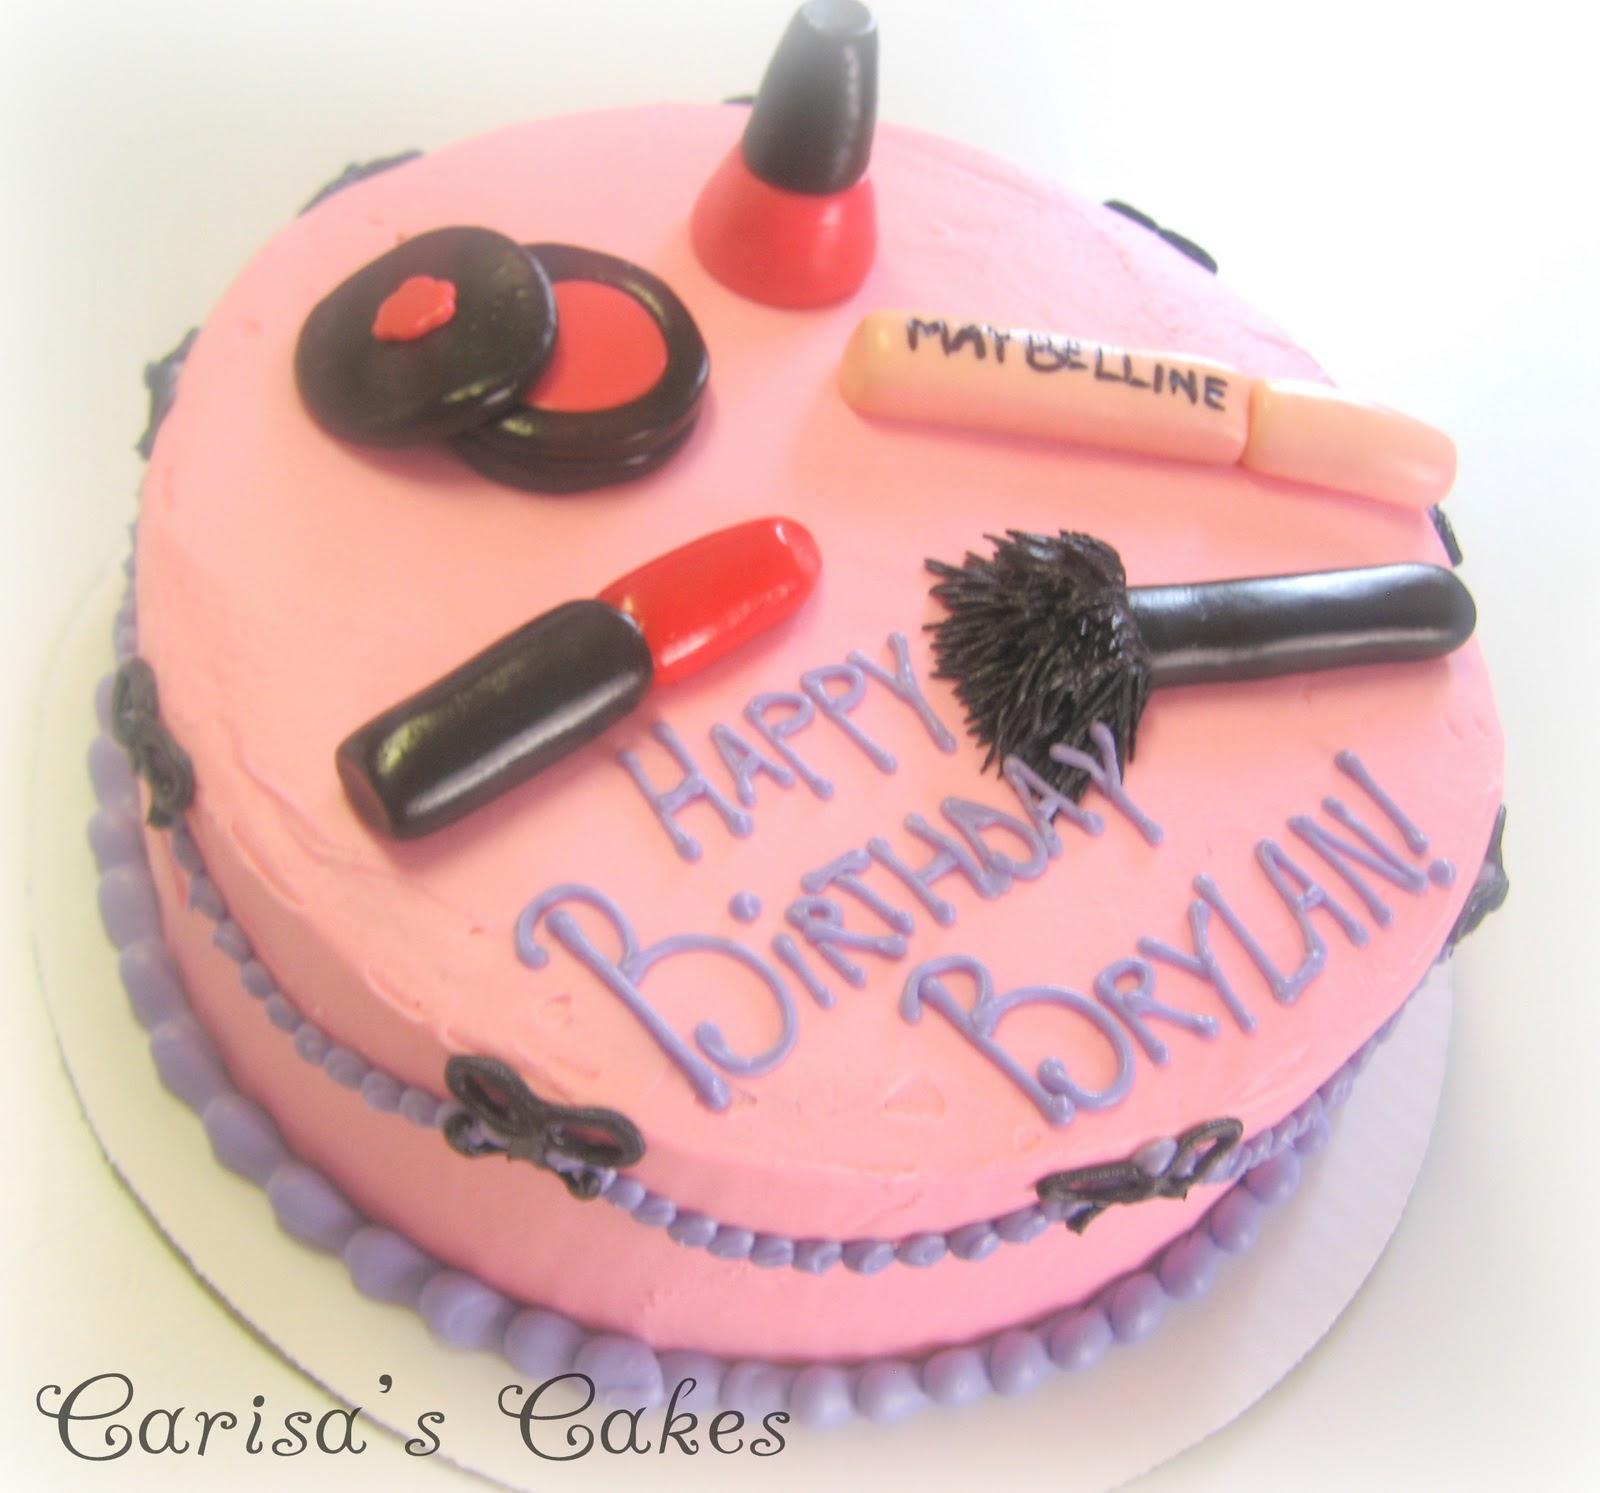 Makeup Cake Pictures : Carisa s Cakes: A Makeup Birthday Cake!